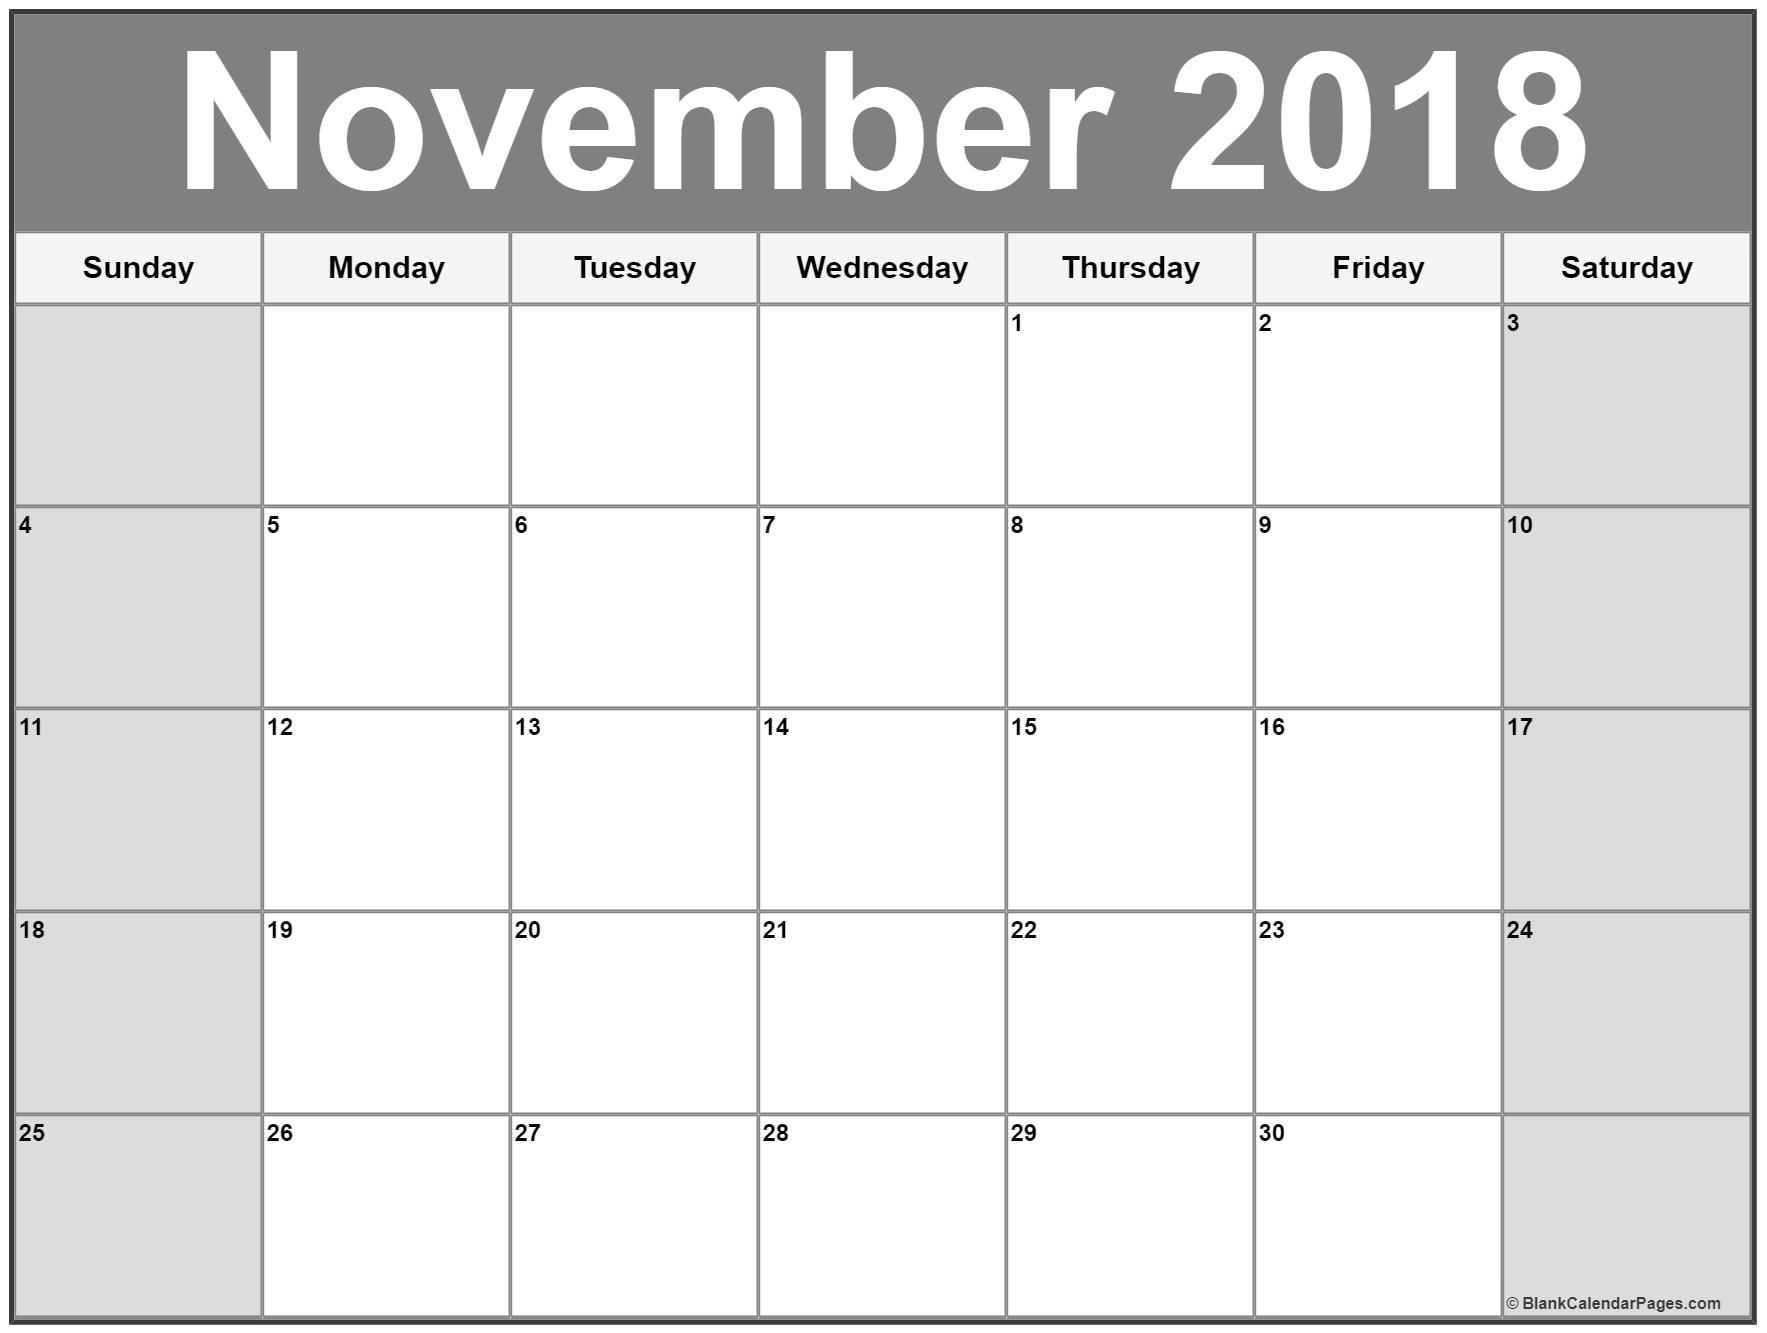 Free November 2018 Calendar Printable